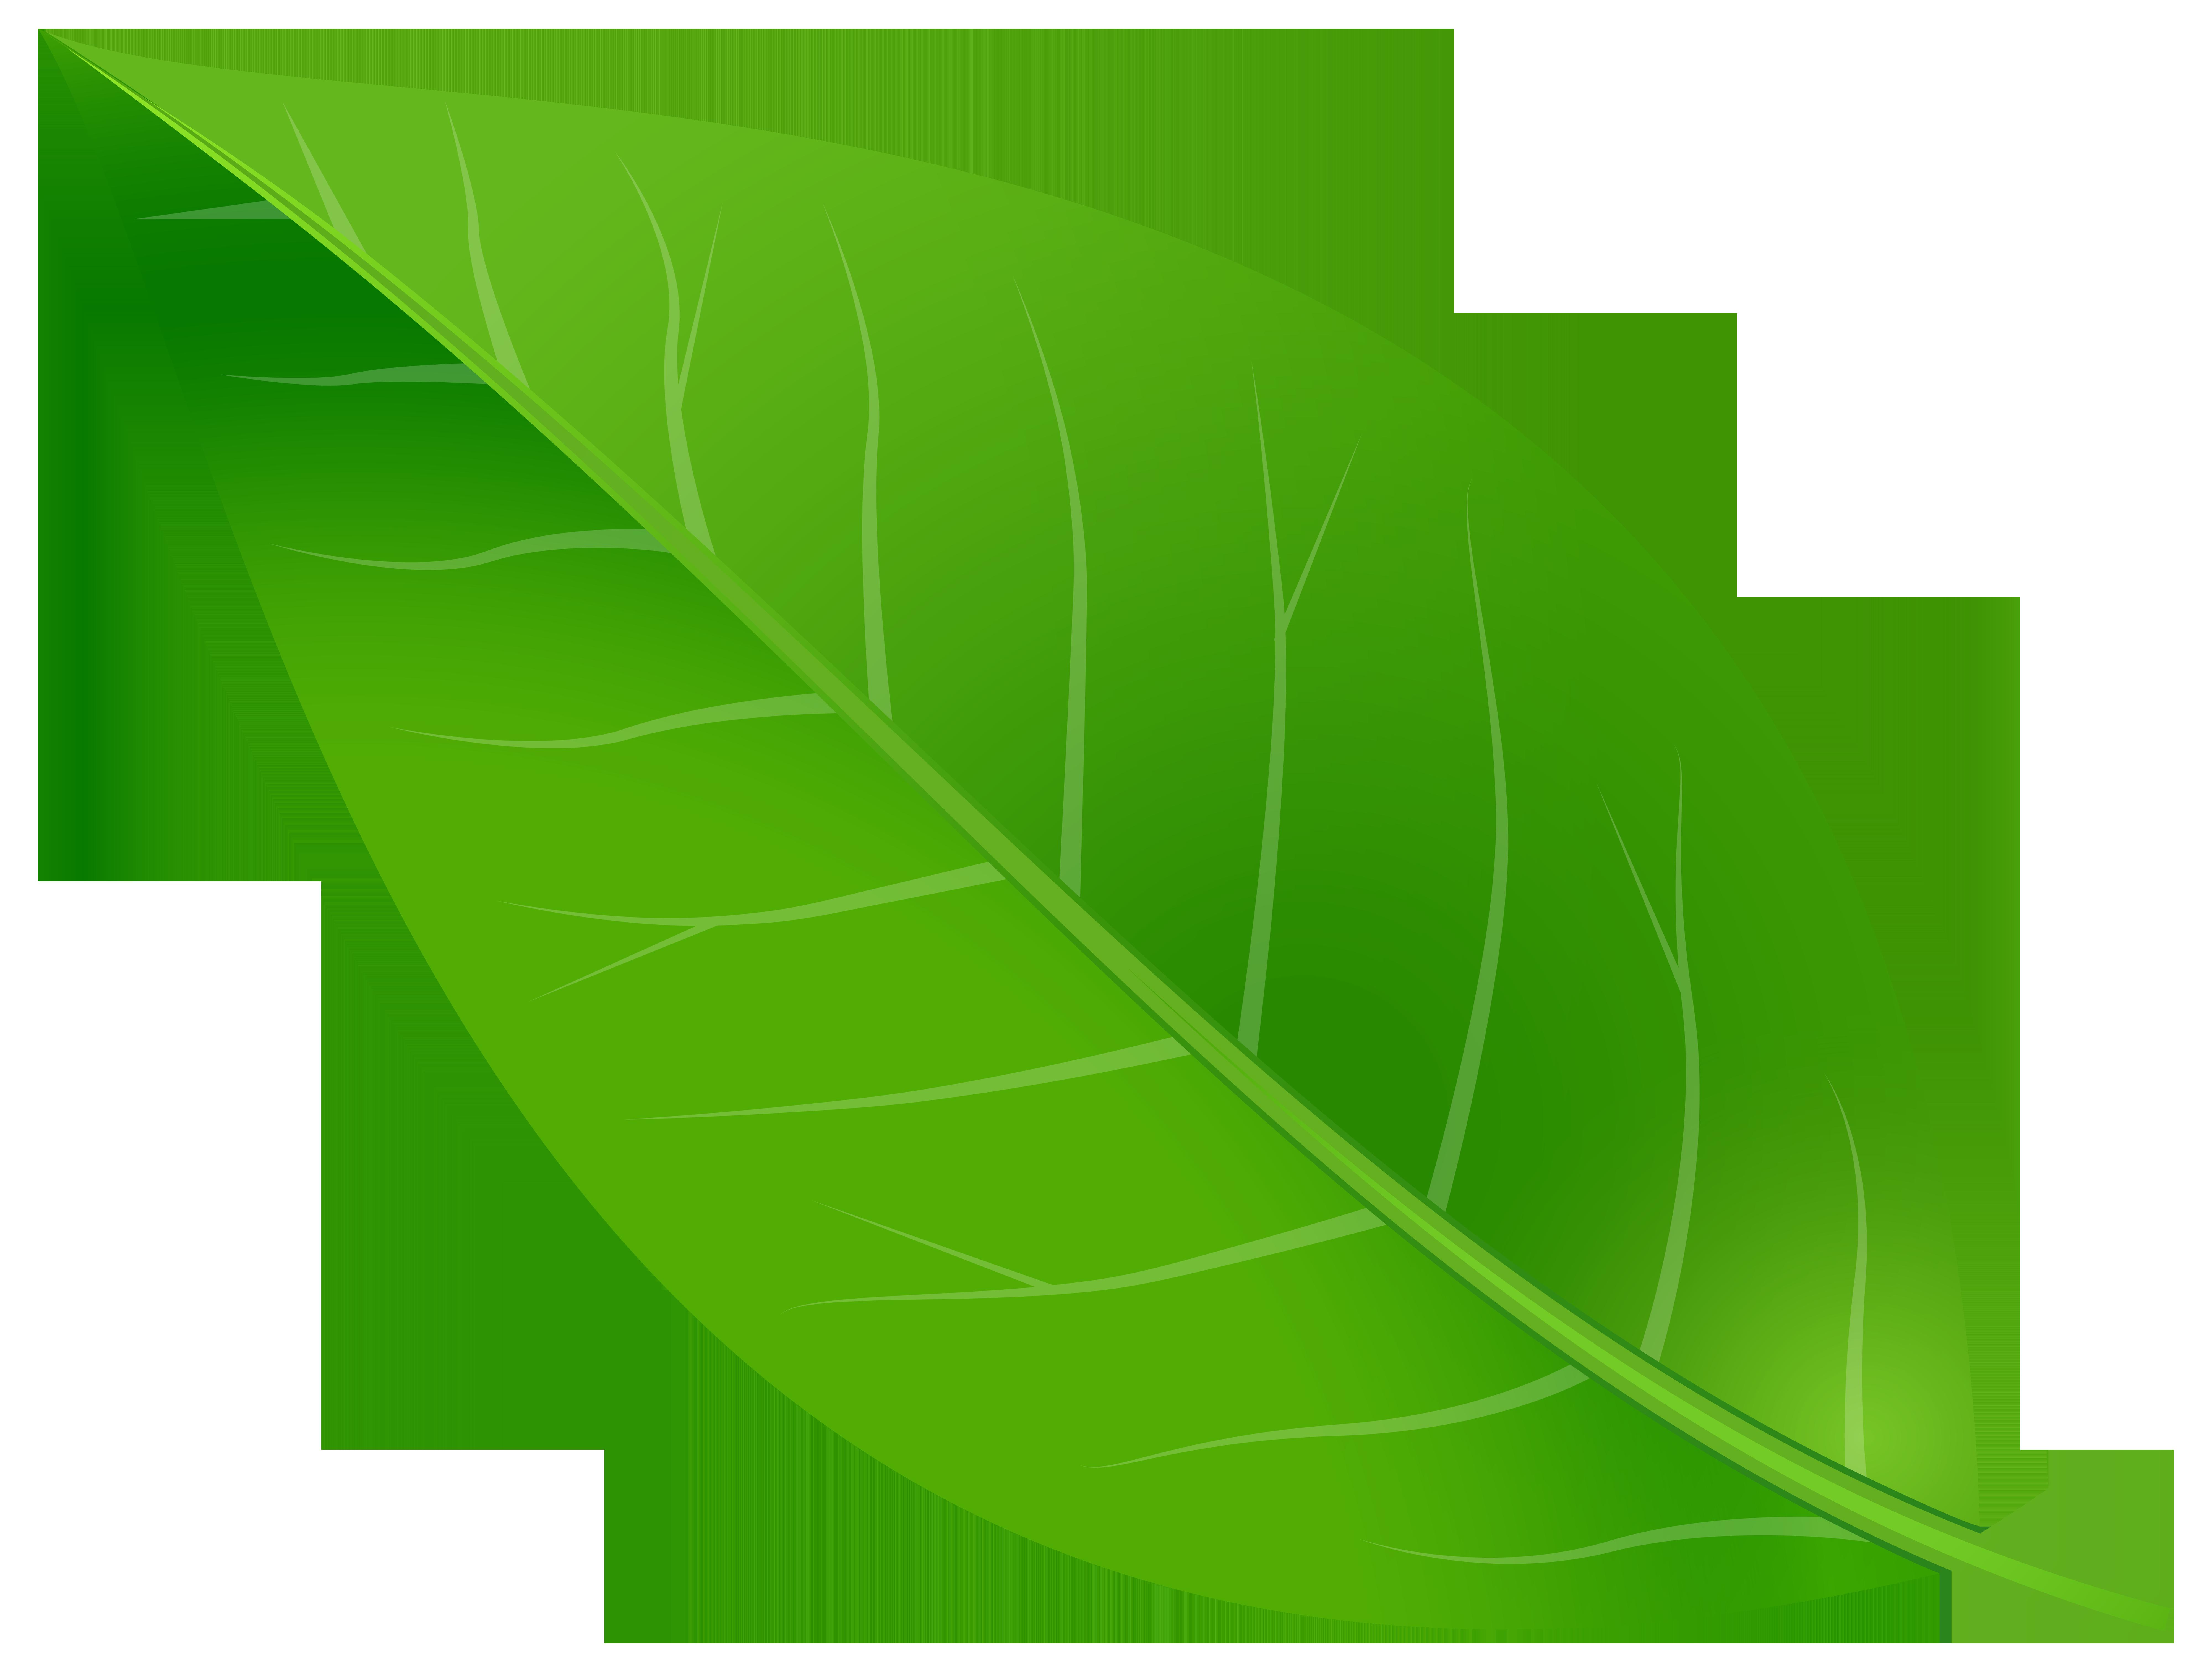 Leaf clip art green. Clipart leaves color